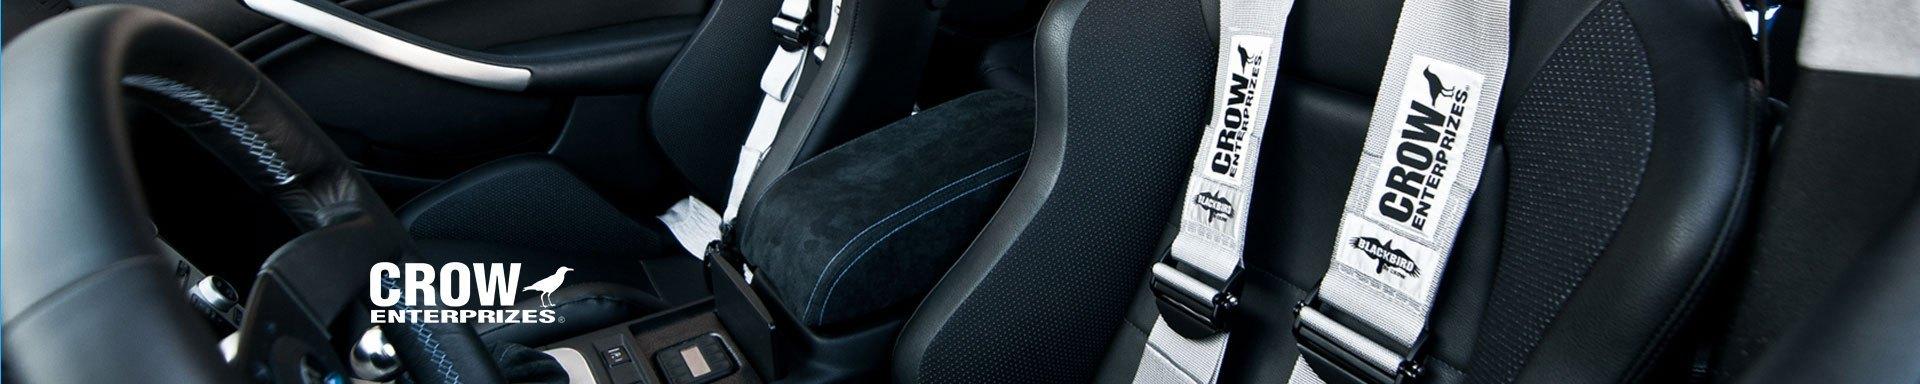 Crow Enterprizes Seat Covers